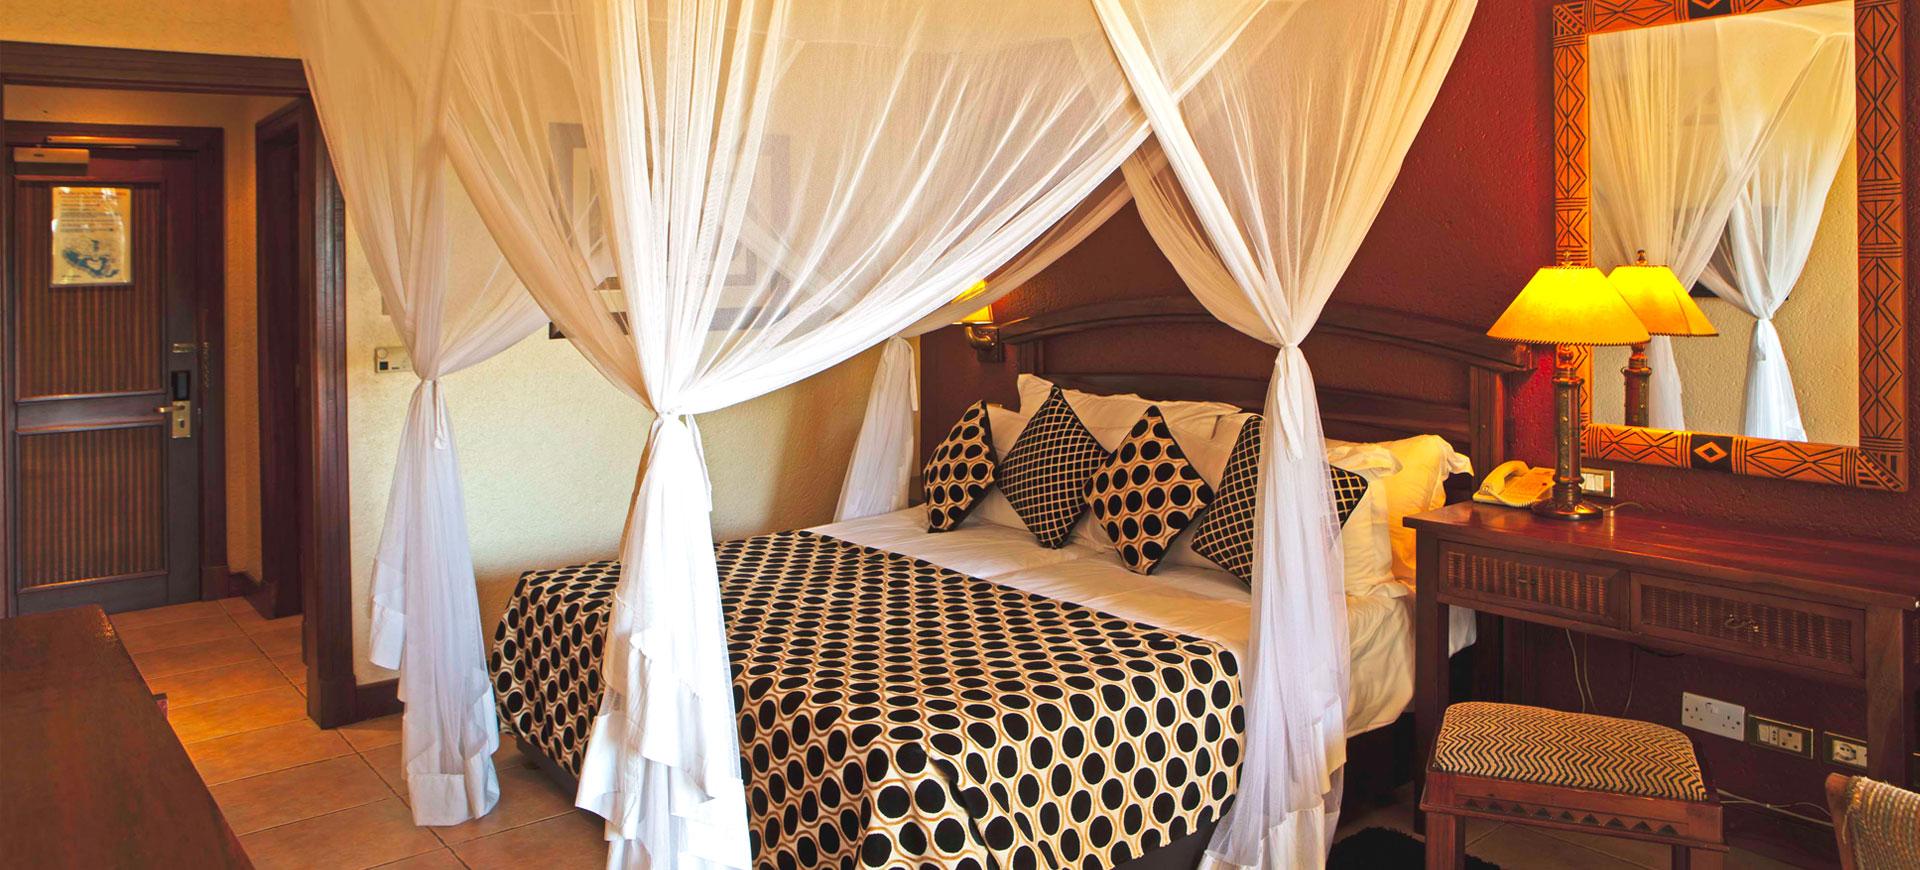 Kingdom Hotel Victoria Falls Conference Accommodation